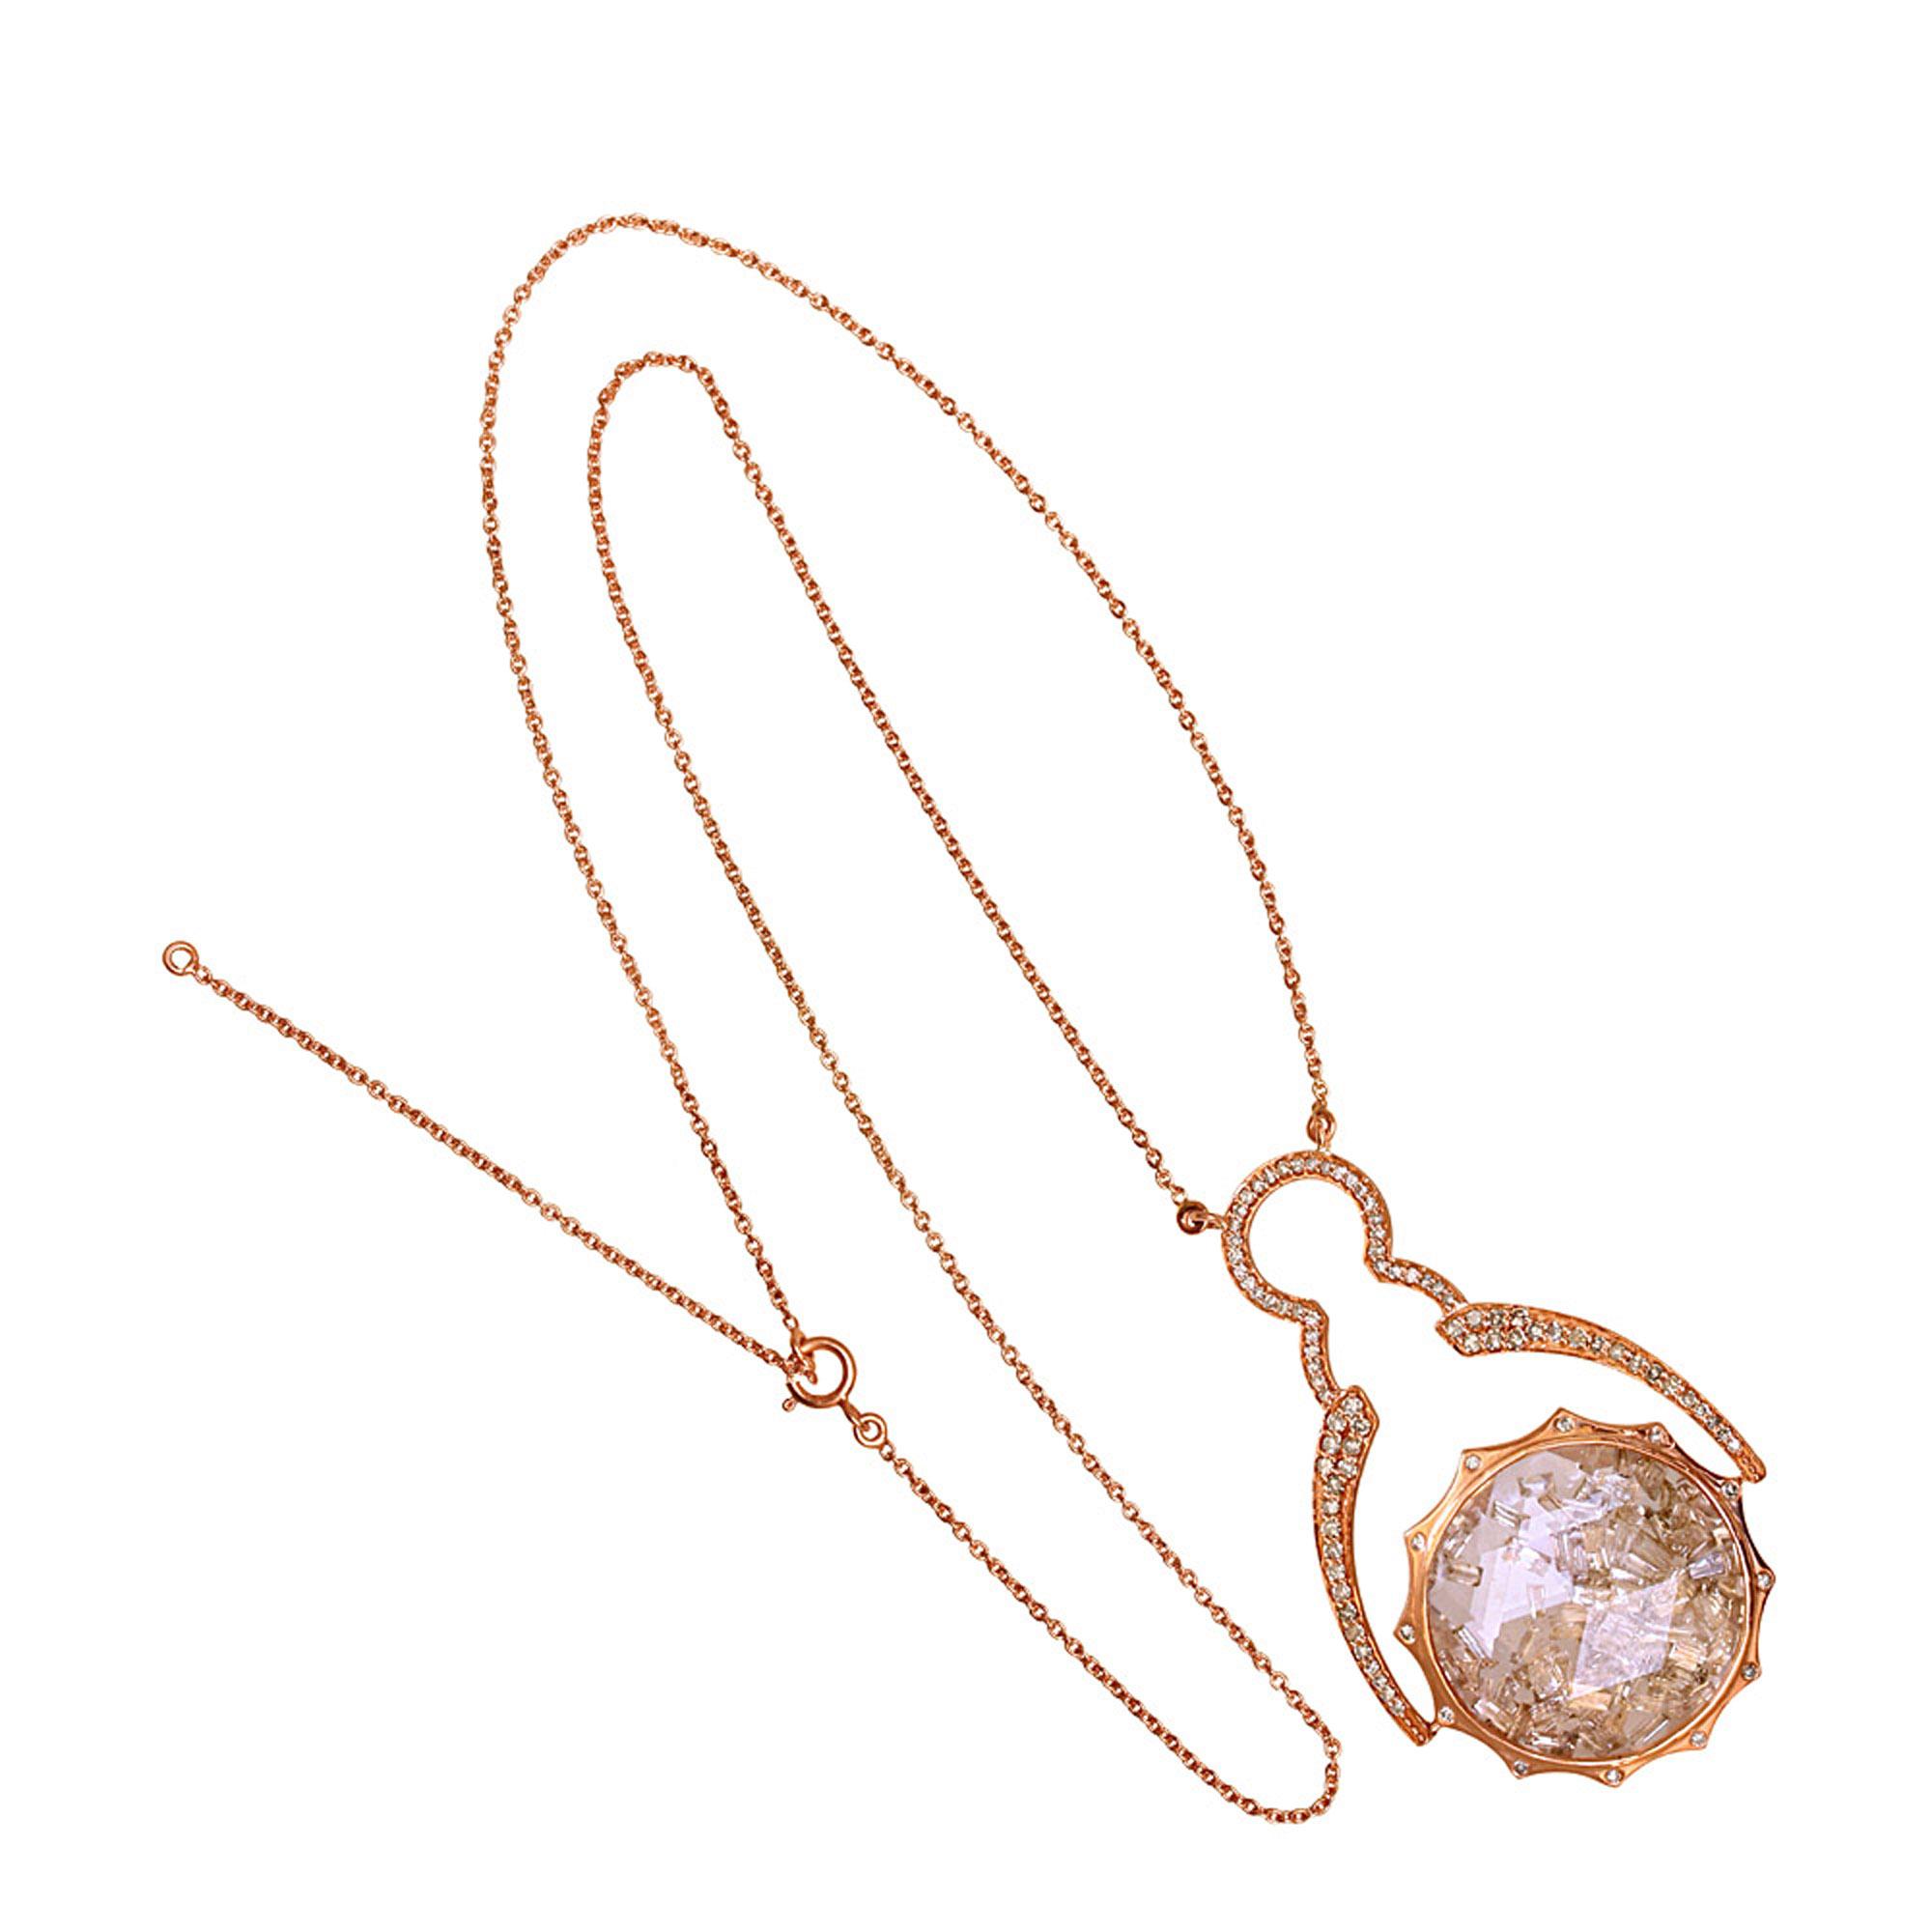 18k rose gold baguette diamond crystal shaker pendant with chain